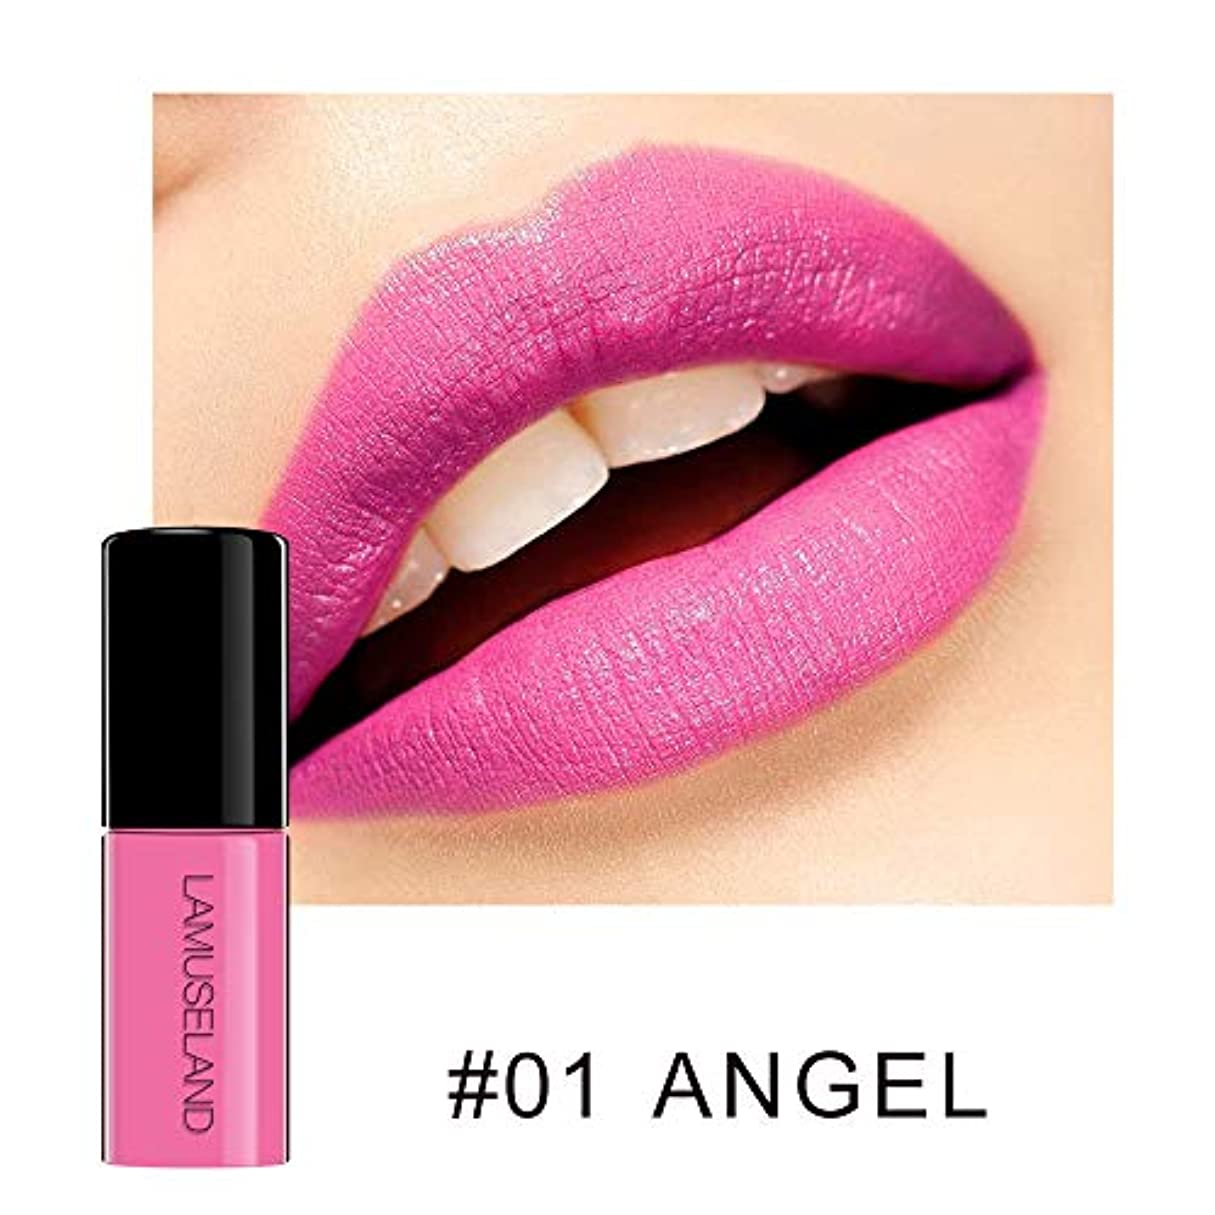 MeterMall 防水長続きがする無光沢の液体の口紅の裸の唇の光沢のビロードの唇の色合いの構造 #01 ANGEL 3.5g